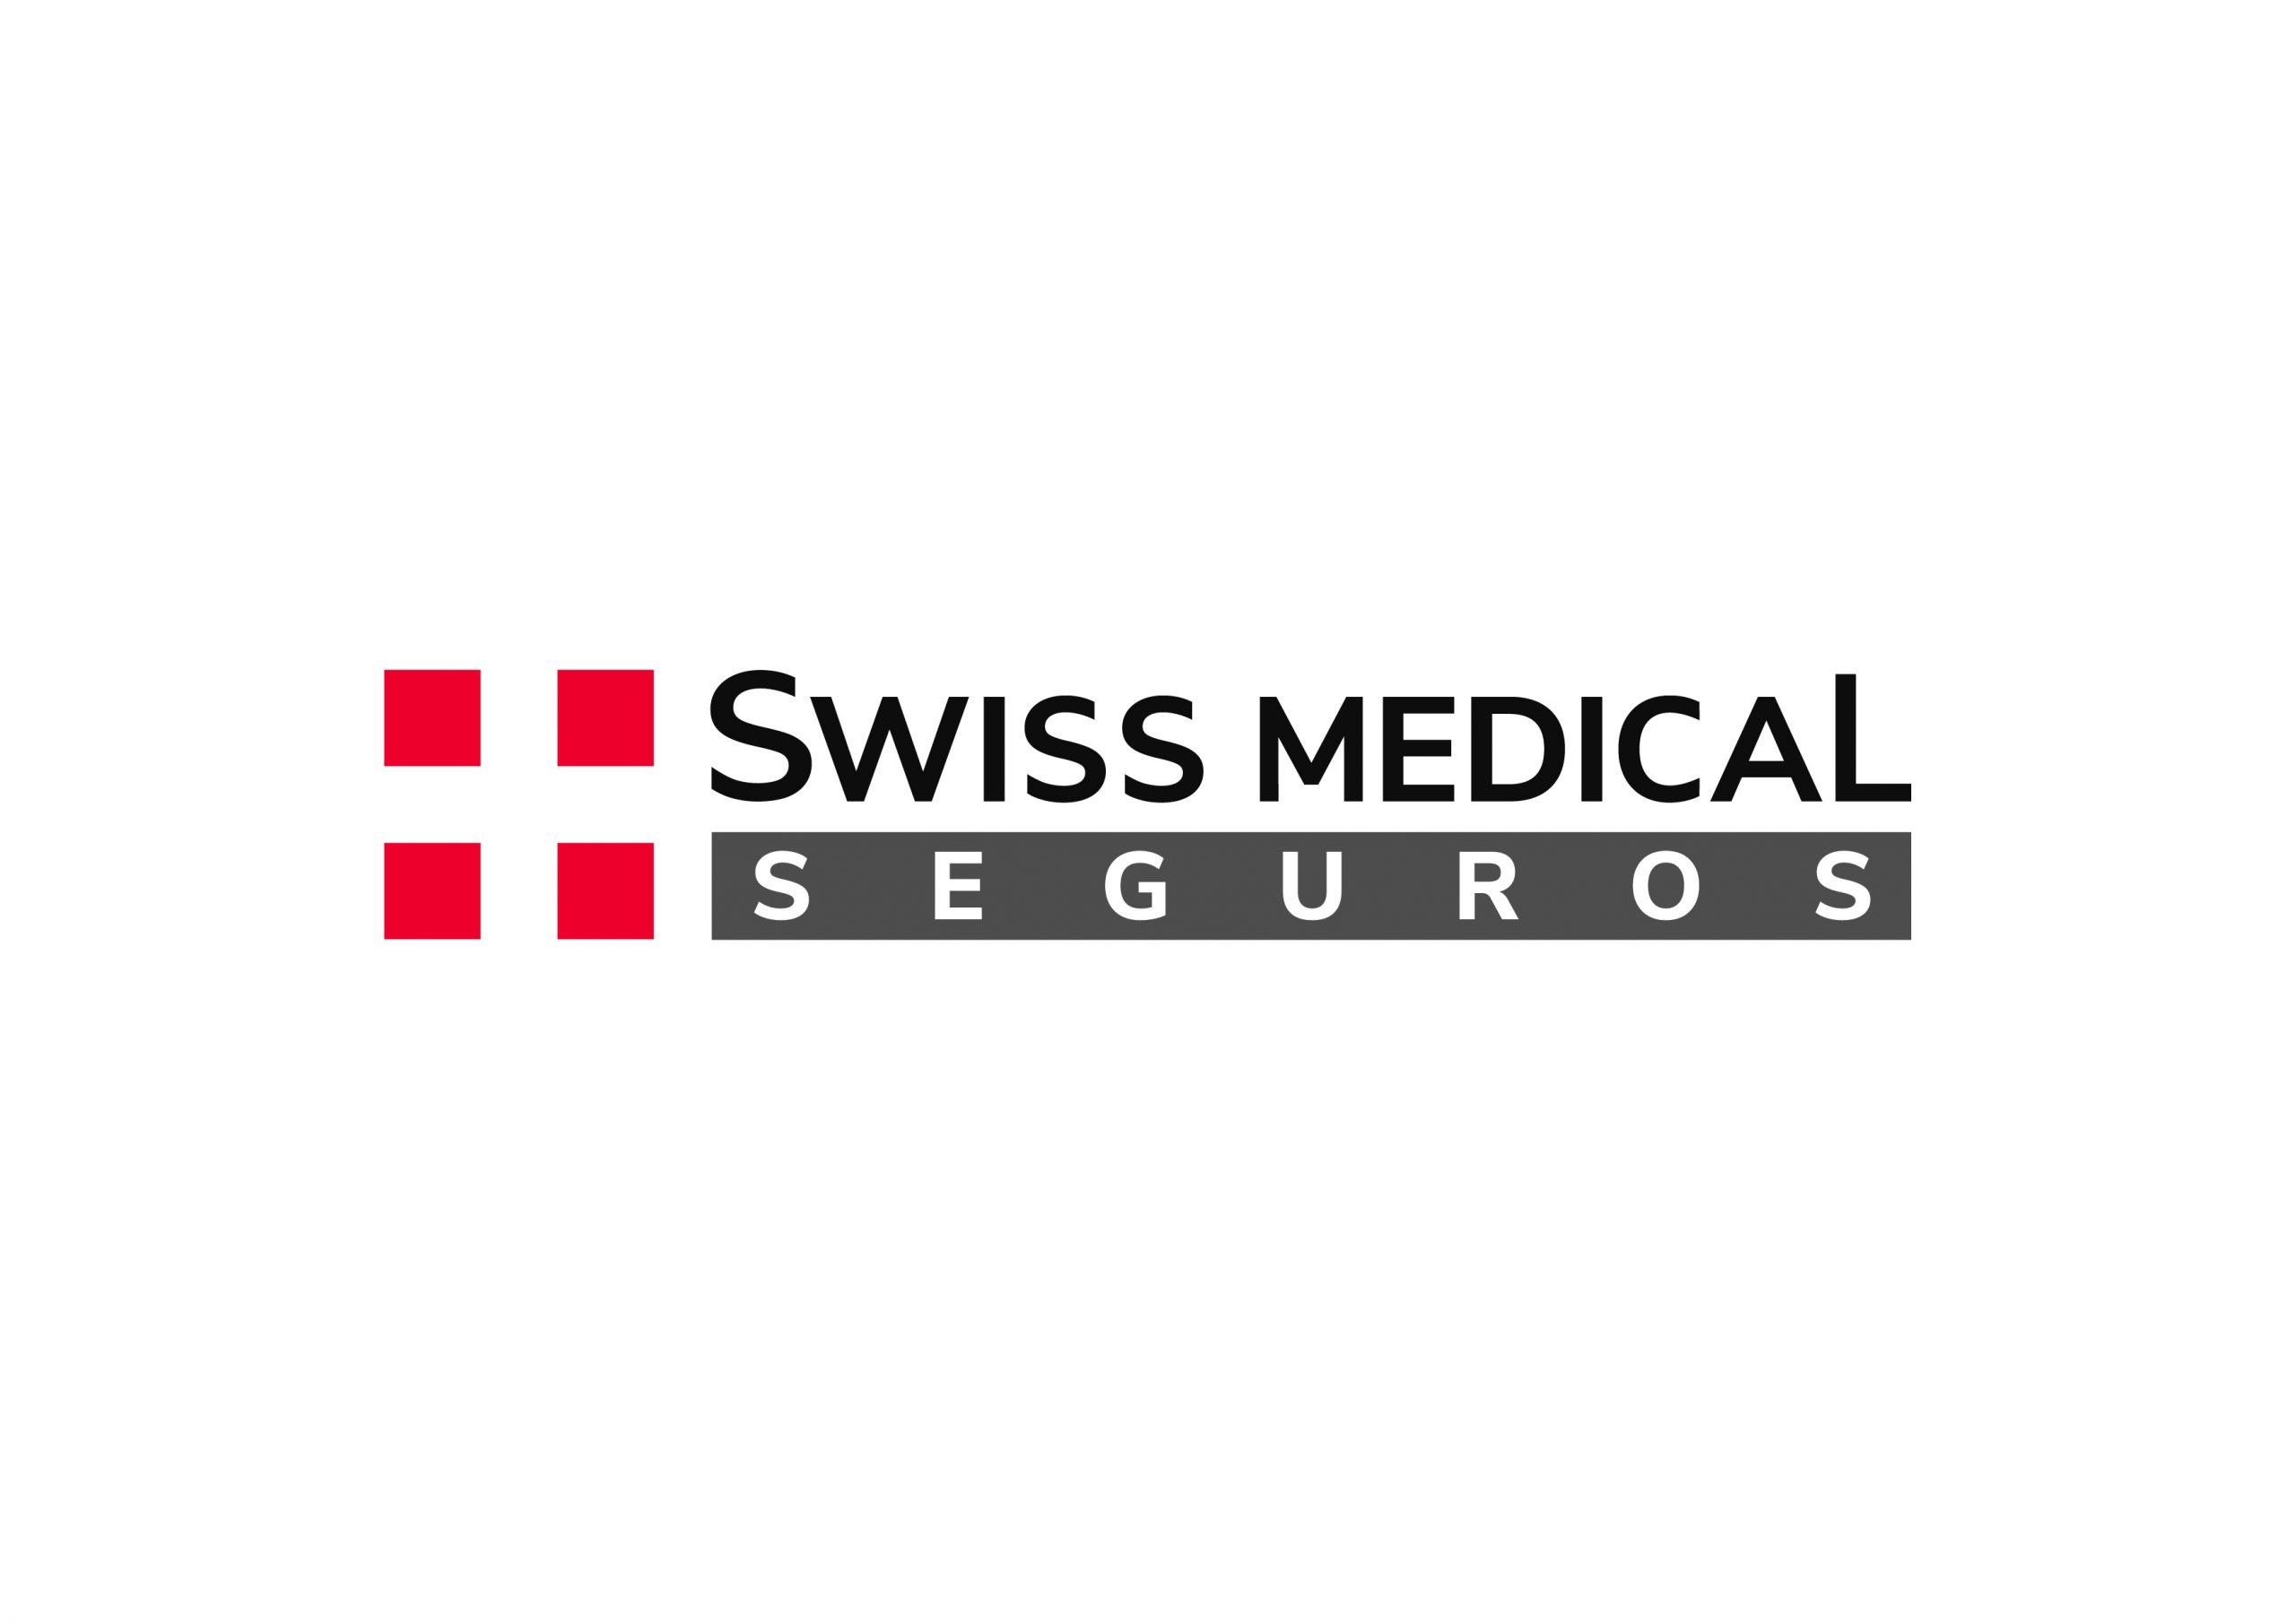 Swiss Medical Seguros